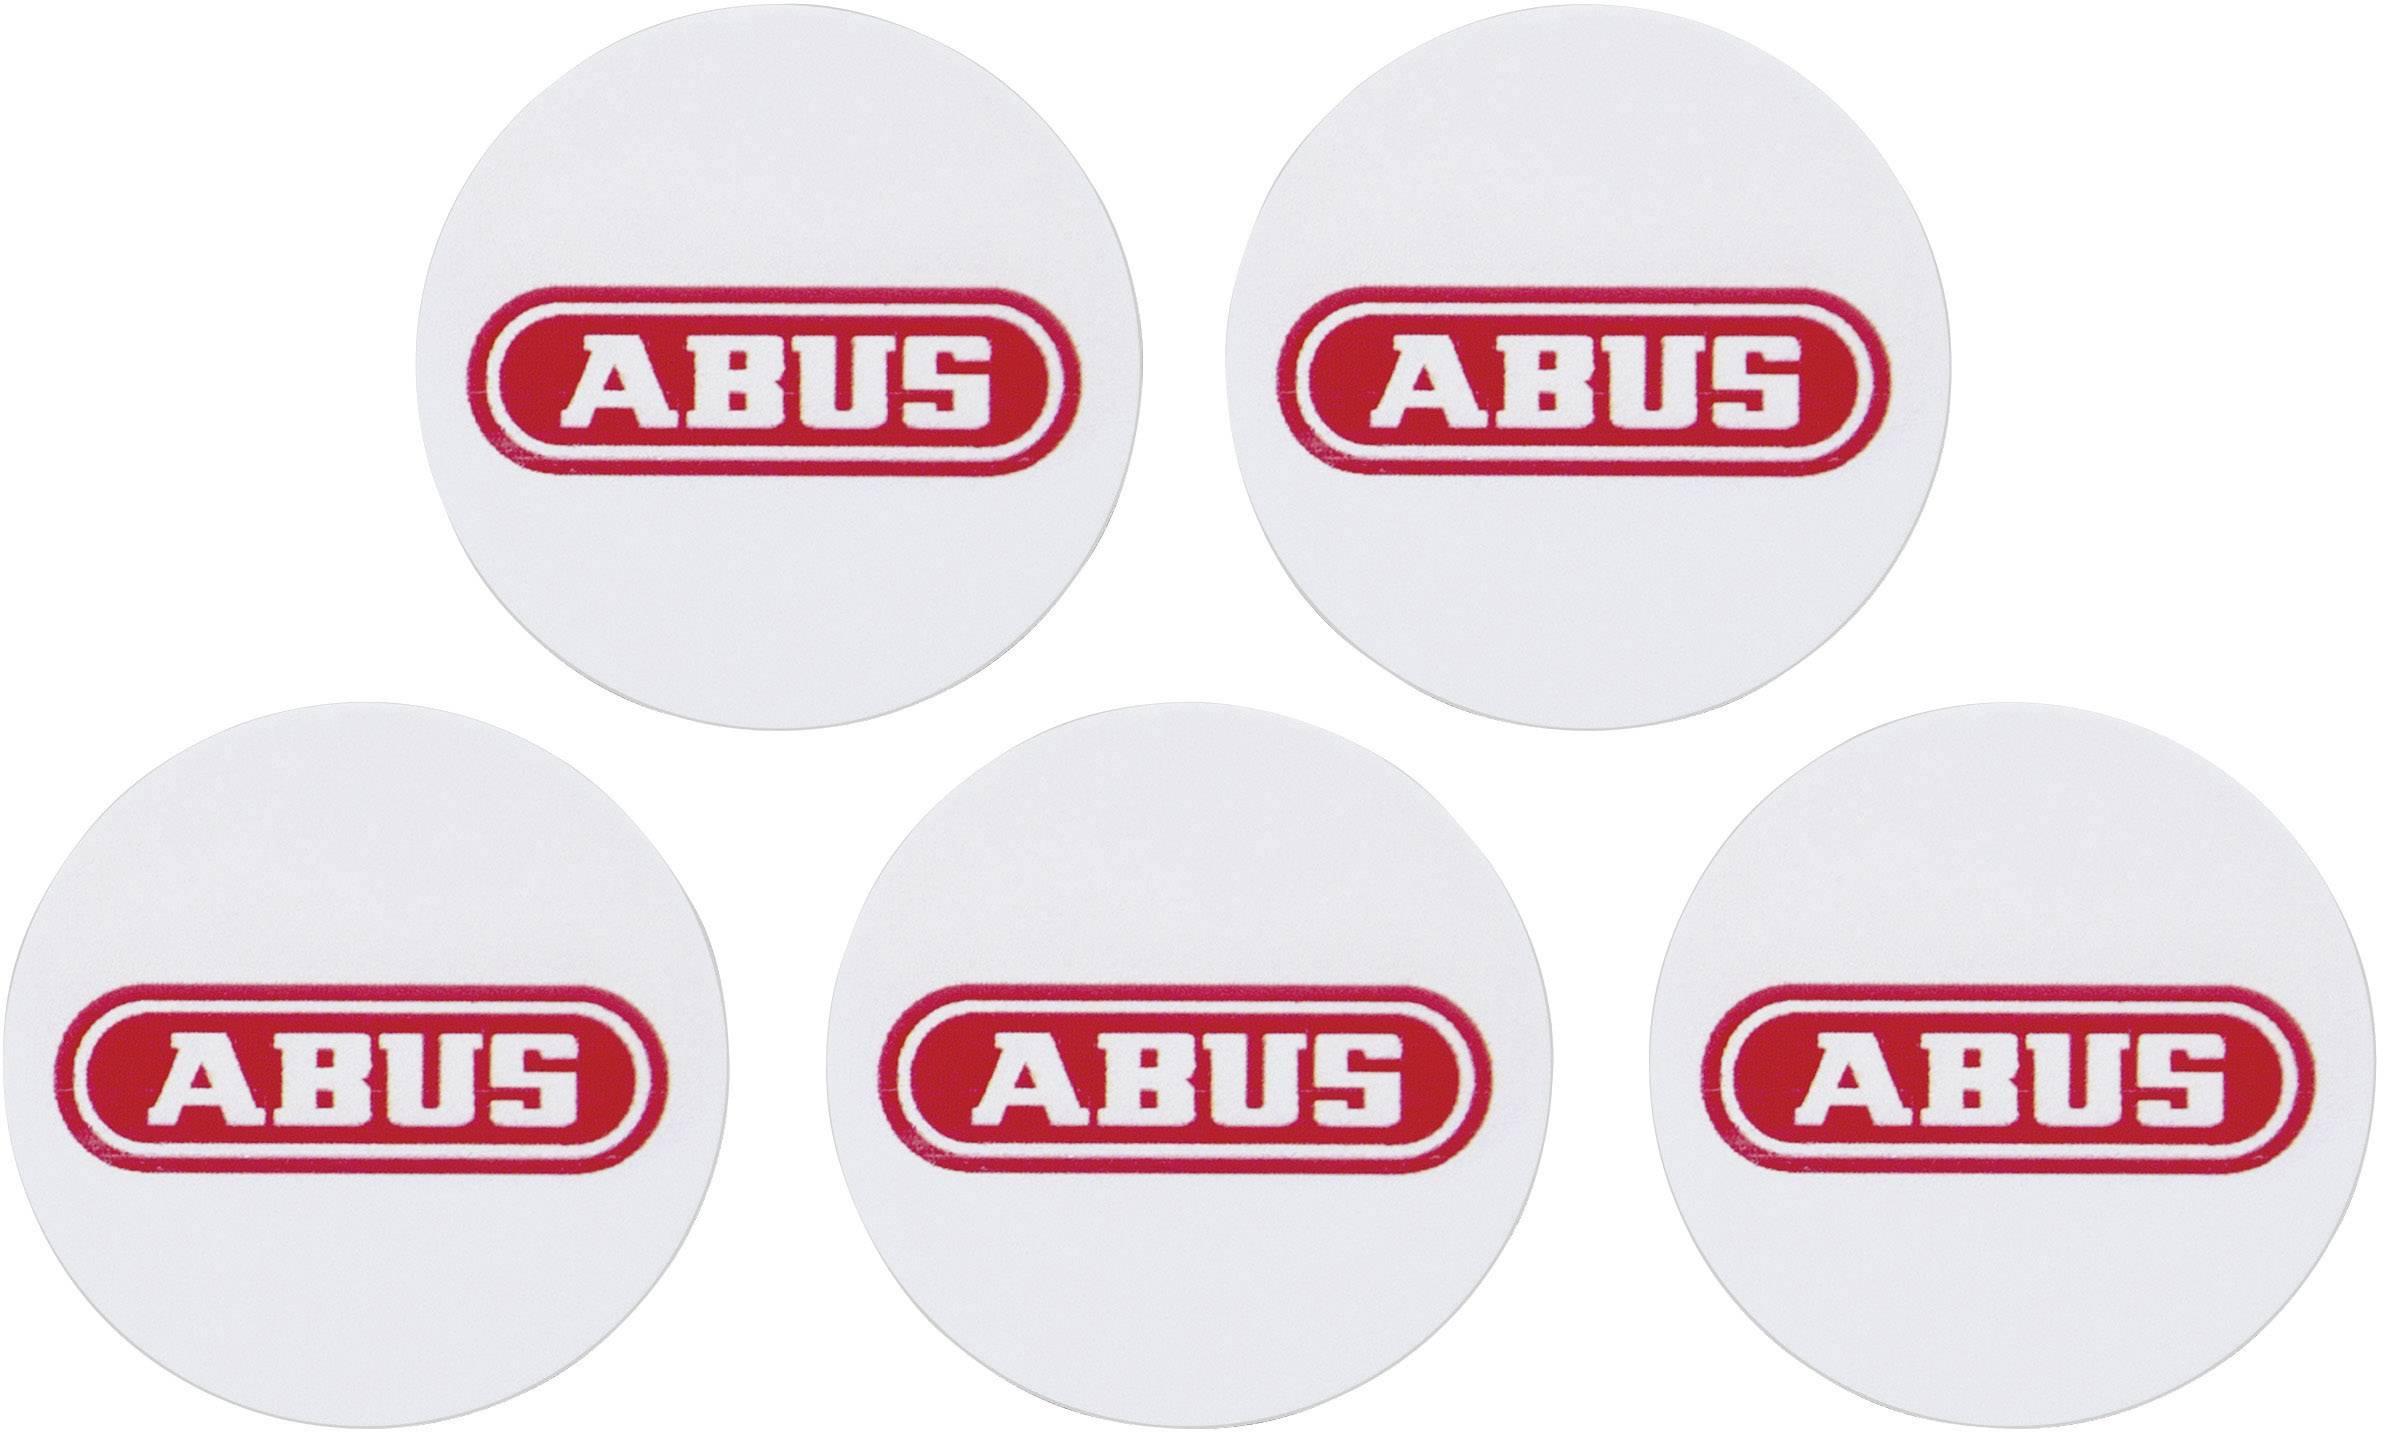 Čipová proximity samolepka pre aktiváciu/deaktiváciu alarmu ABUS Terxon, AZ5502, 5ks